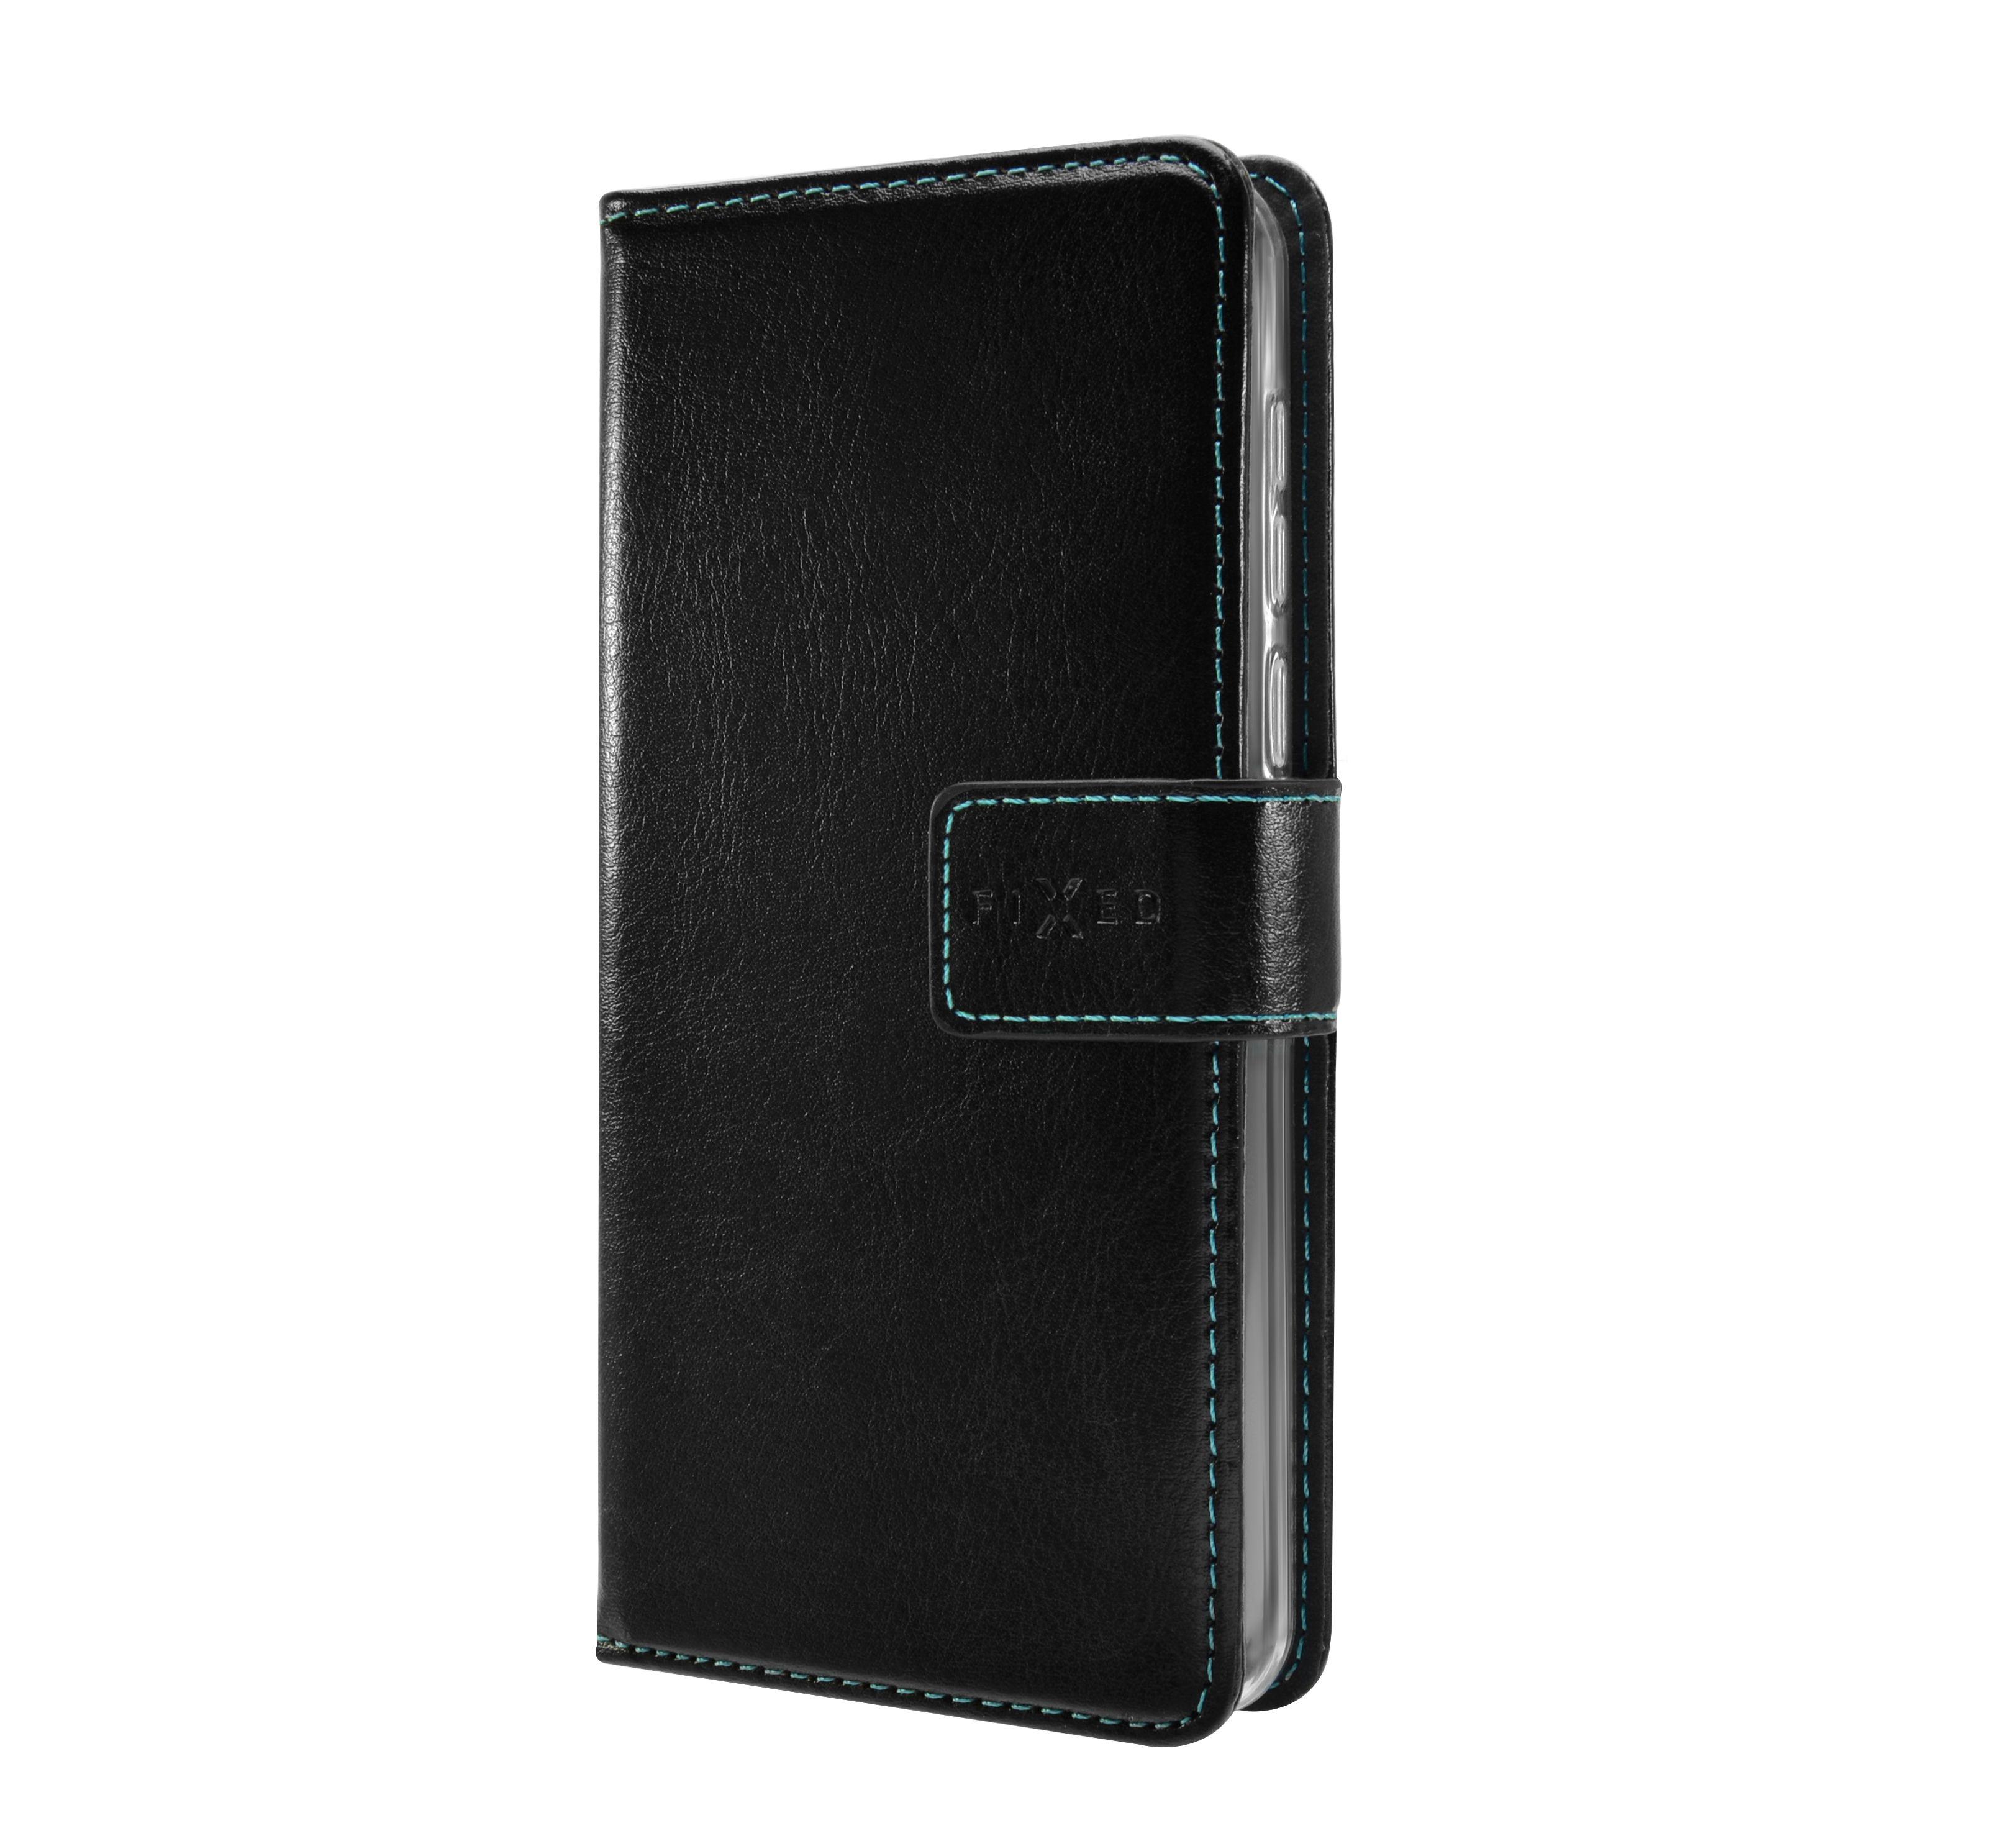 Pouzdro typu kniha FIXED Opus pro Vodafone Smart N9 Lite, černé